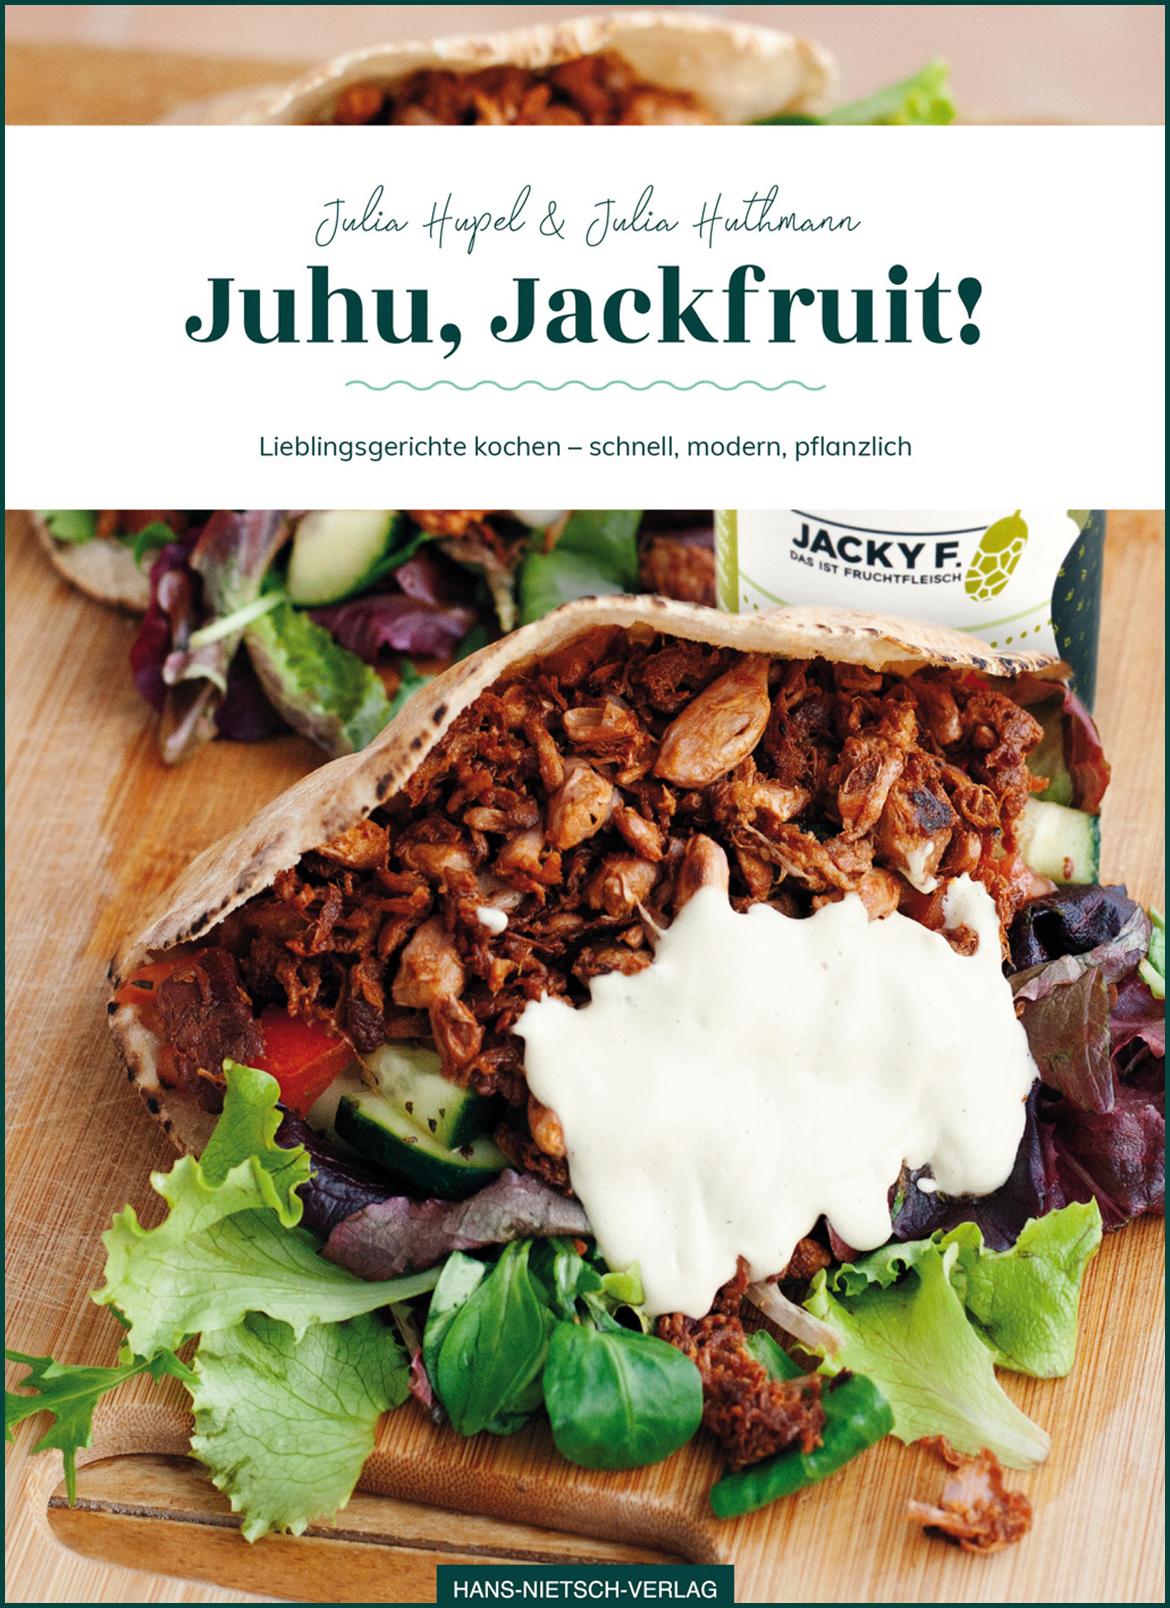 Juhu, Jackfruit! Lieblingsgerichte kochen - schnell, modern, pflanzlich